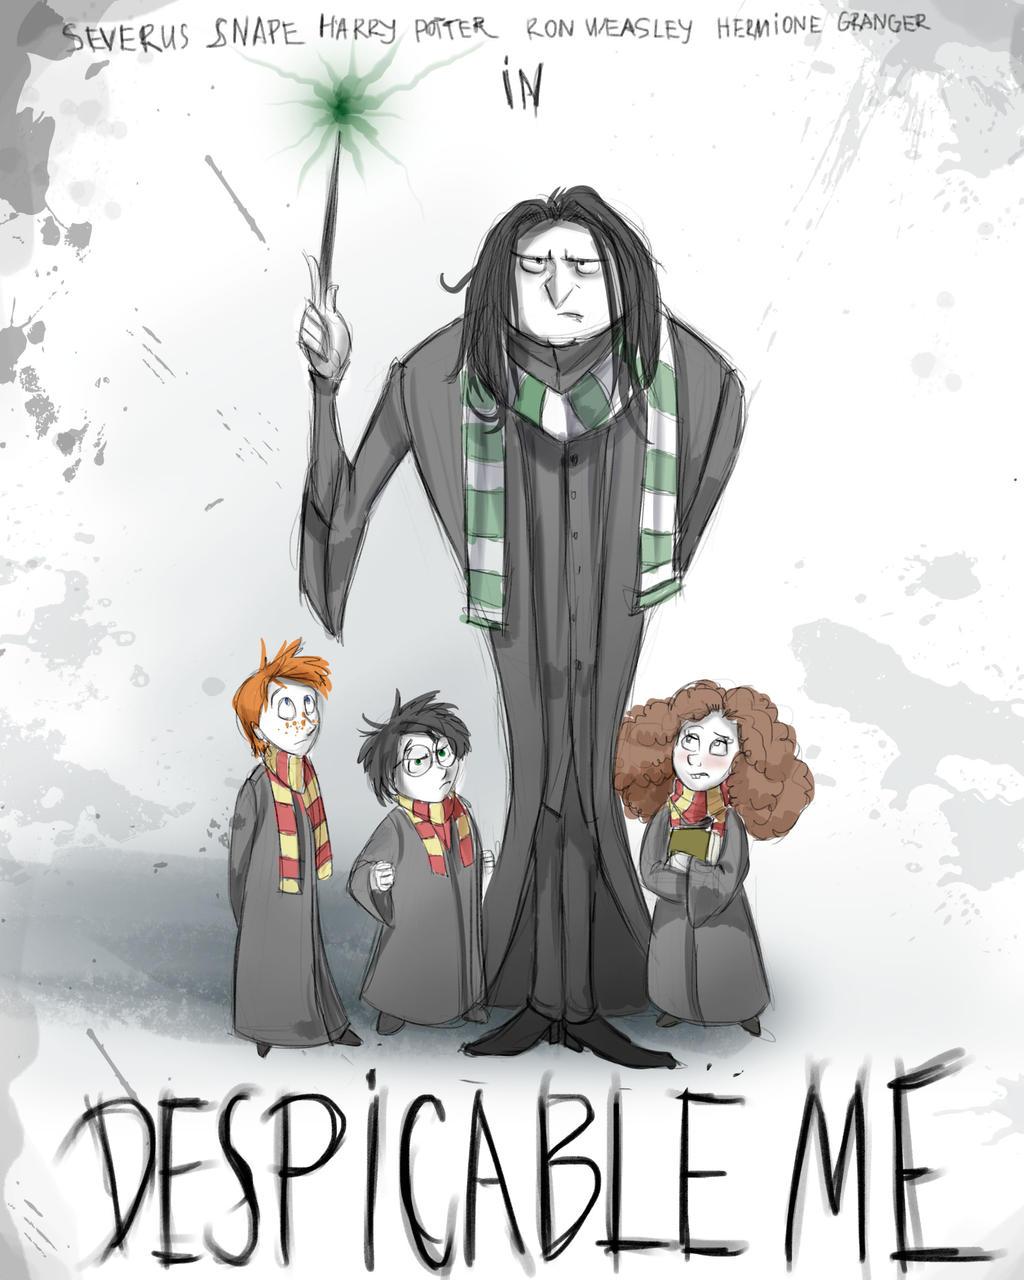 Despicable Snape